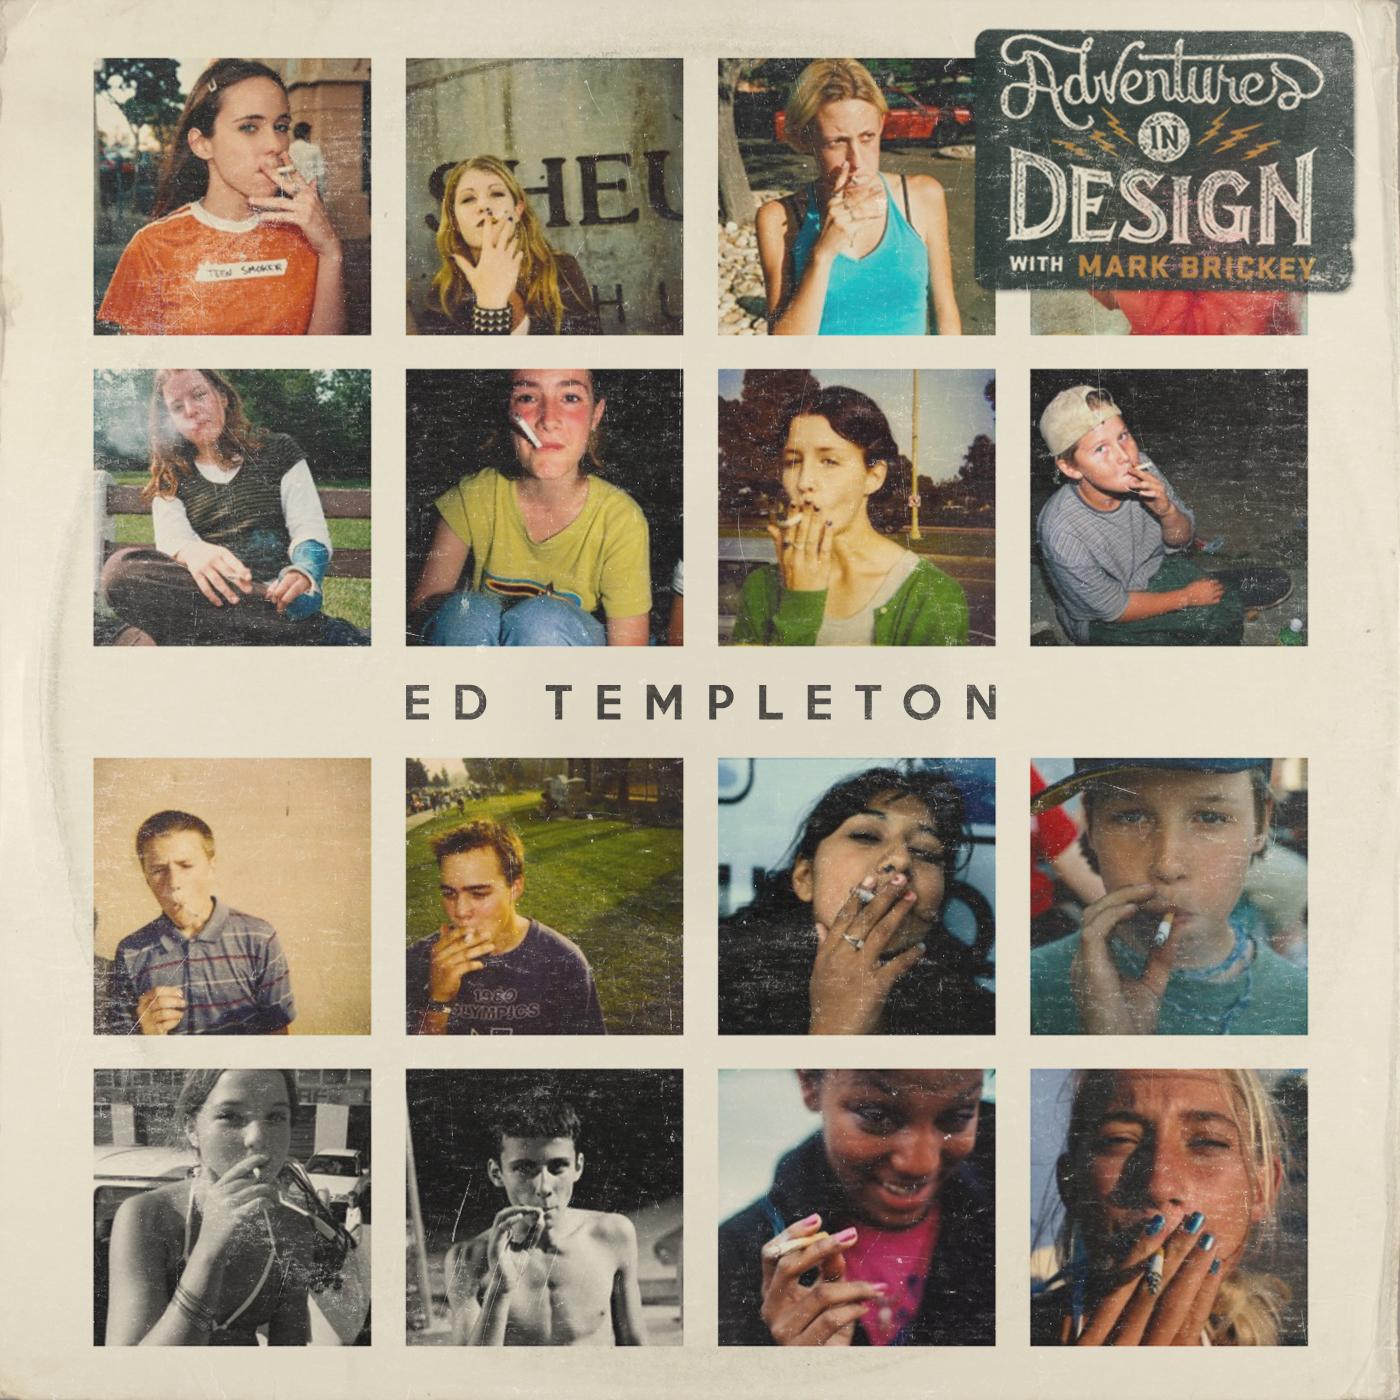 Episode 390 - Ed Templeton